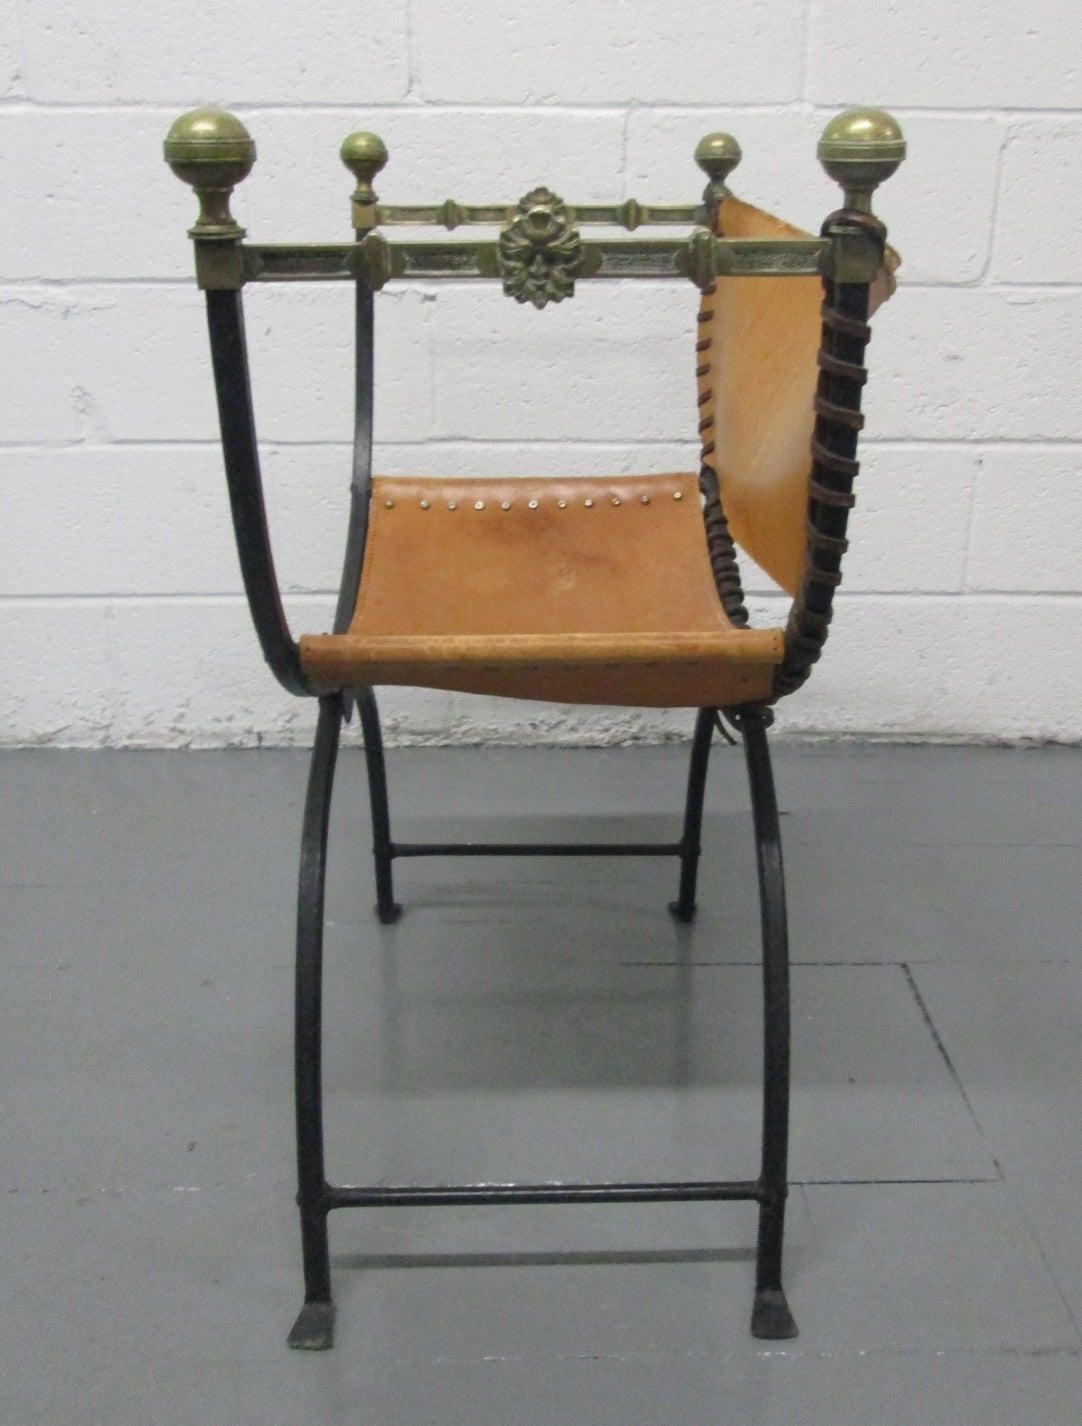 Modern savonarola chair - Italian Curule Savonarola Chair 2